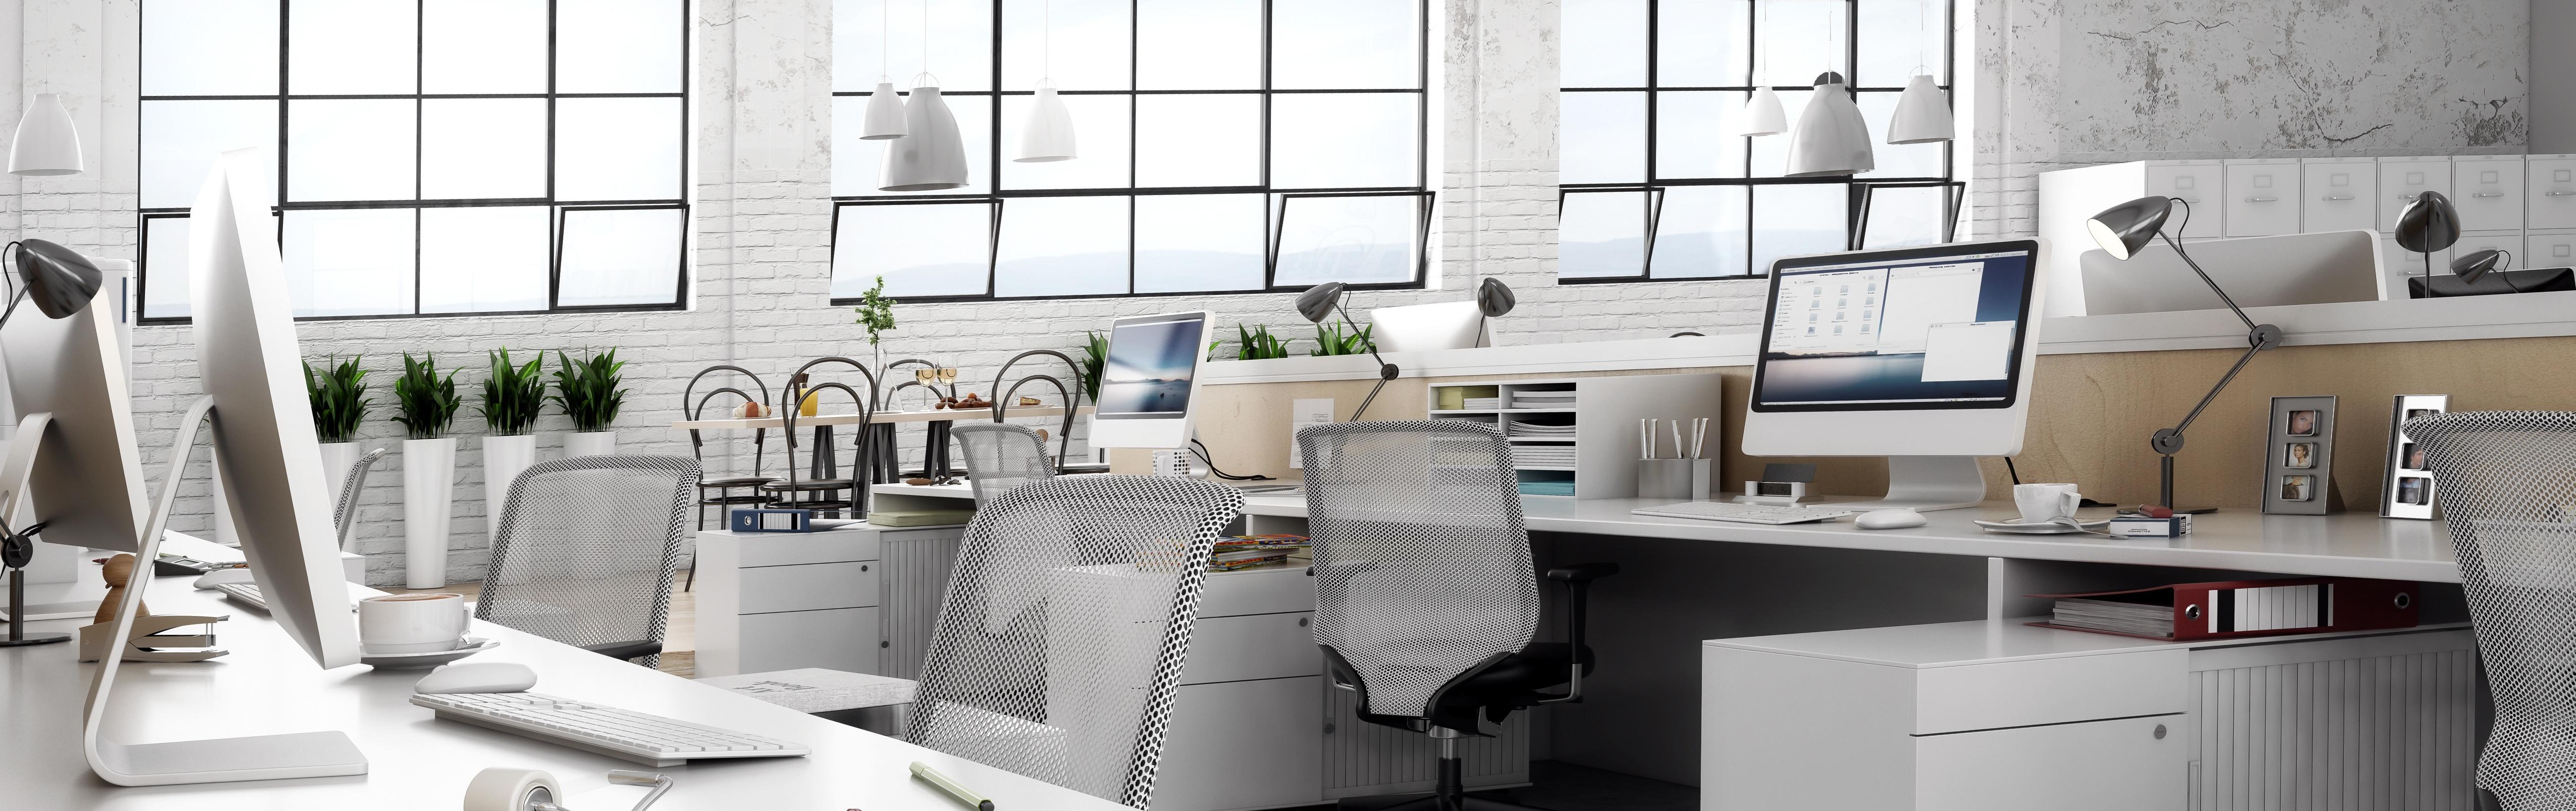 Cool-office.jpeg